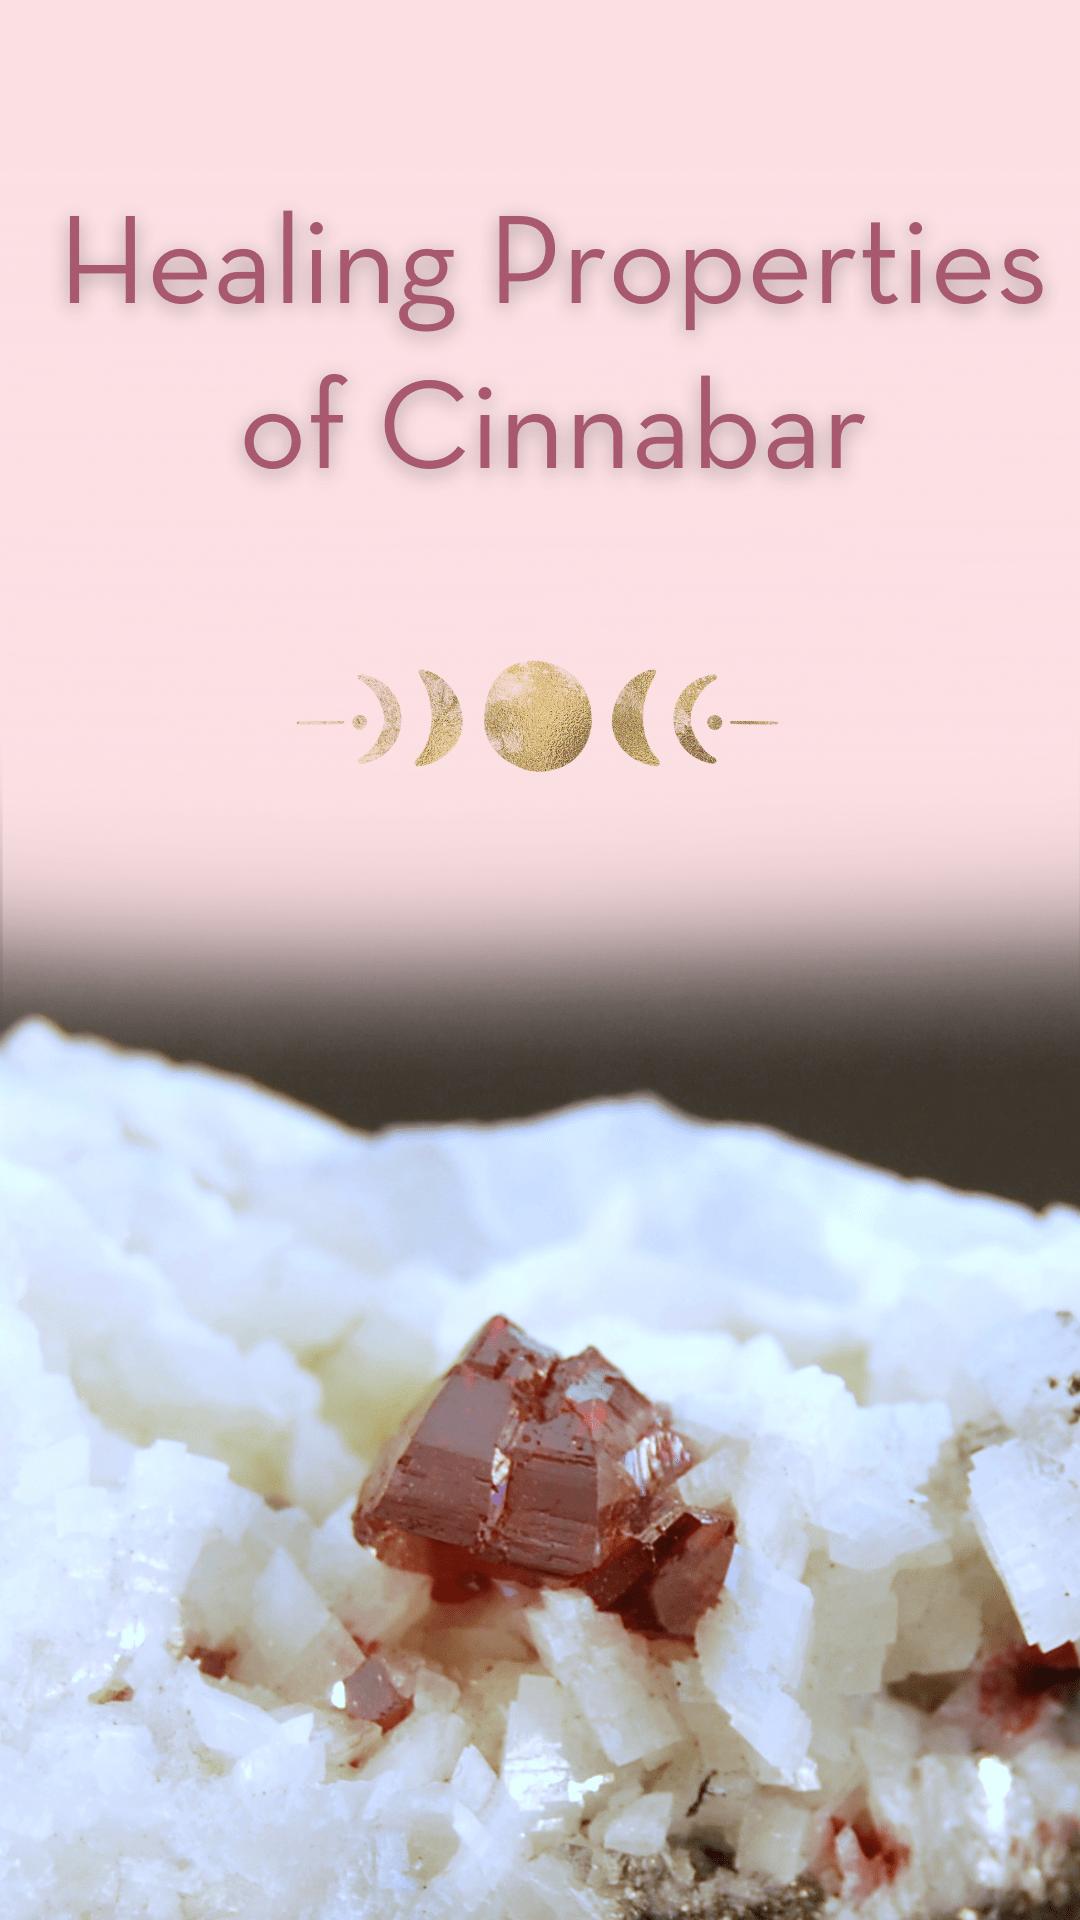 Healing Properties of Cinnabar